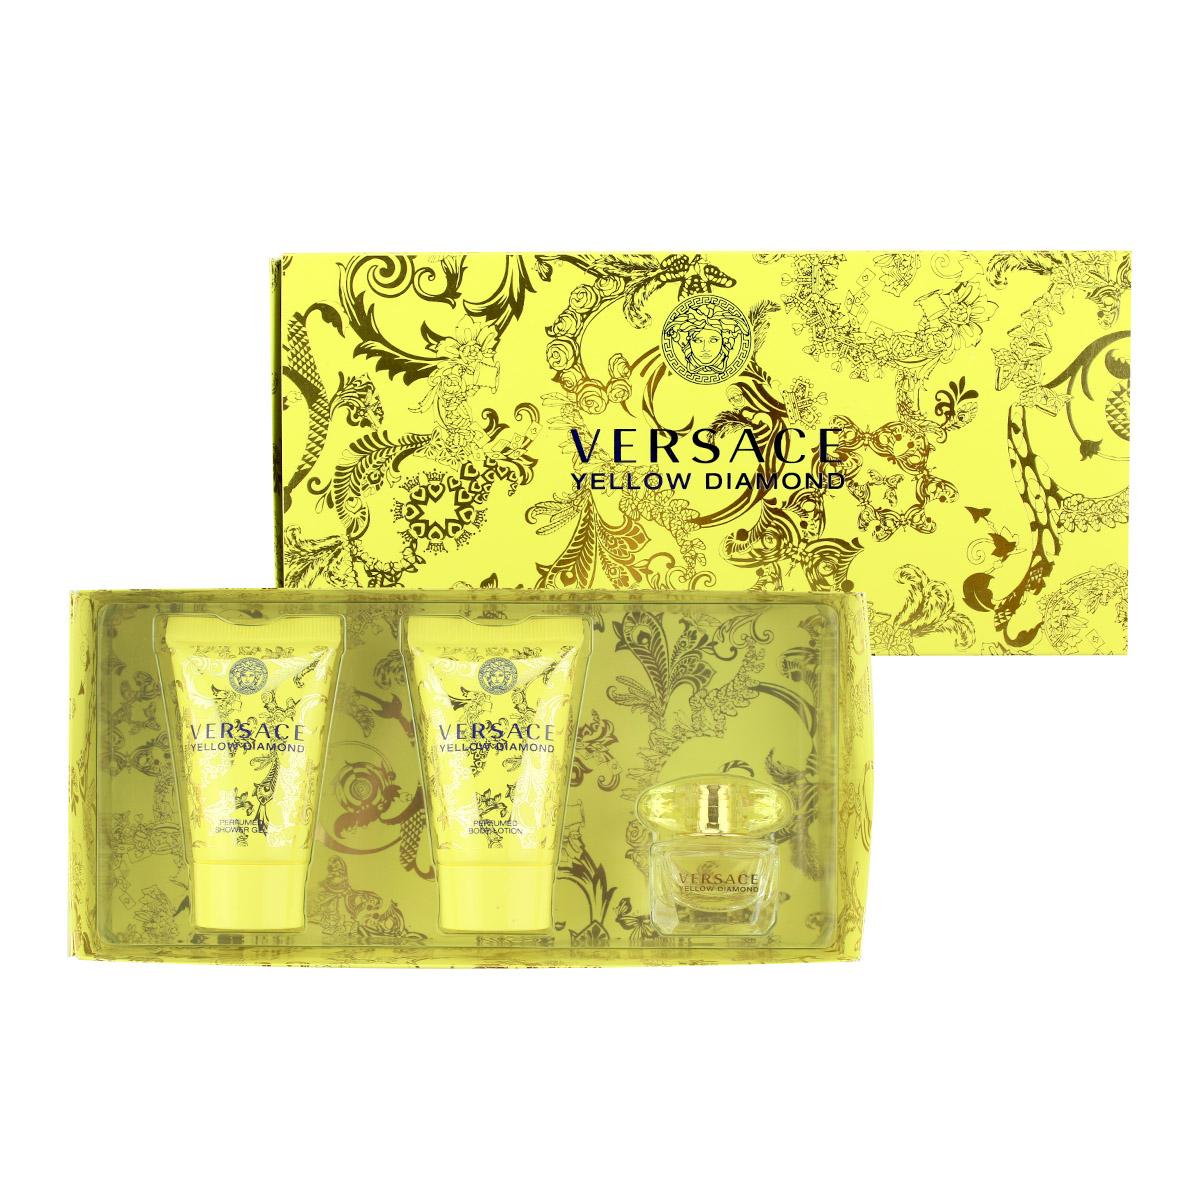 Versace Yellow Diamond EDT MINI 5 ml + SG 25 ml + BL 25 ml W